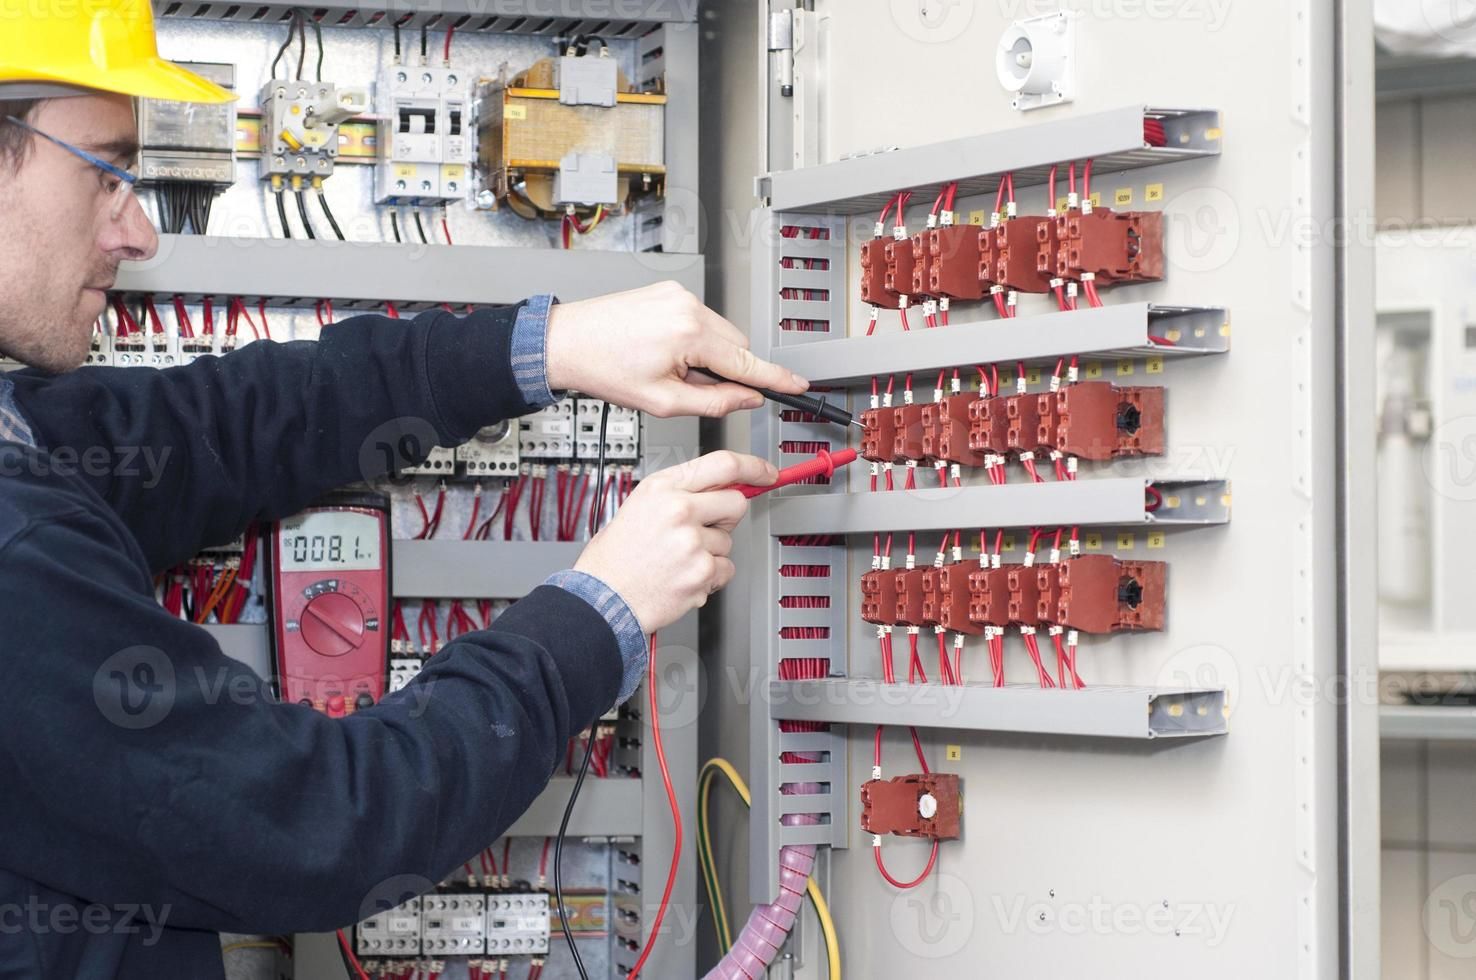 elektricien die industriële machine test foto